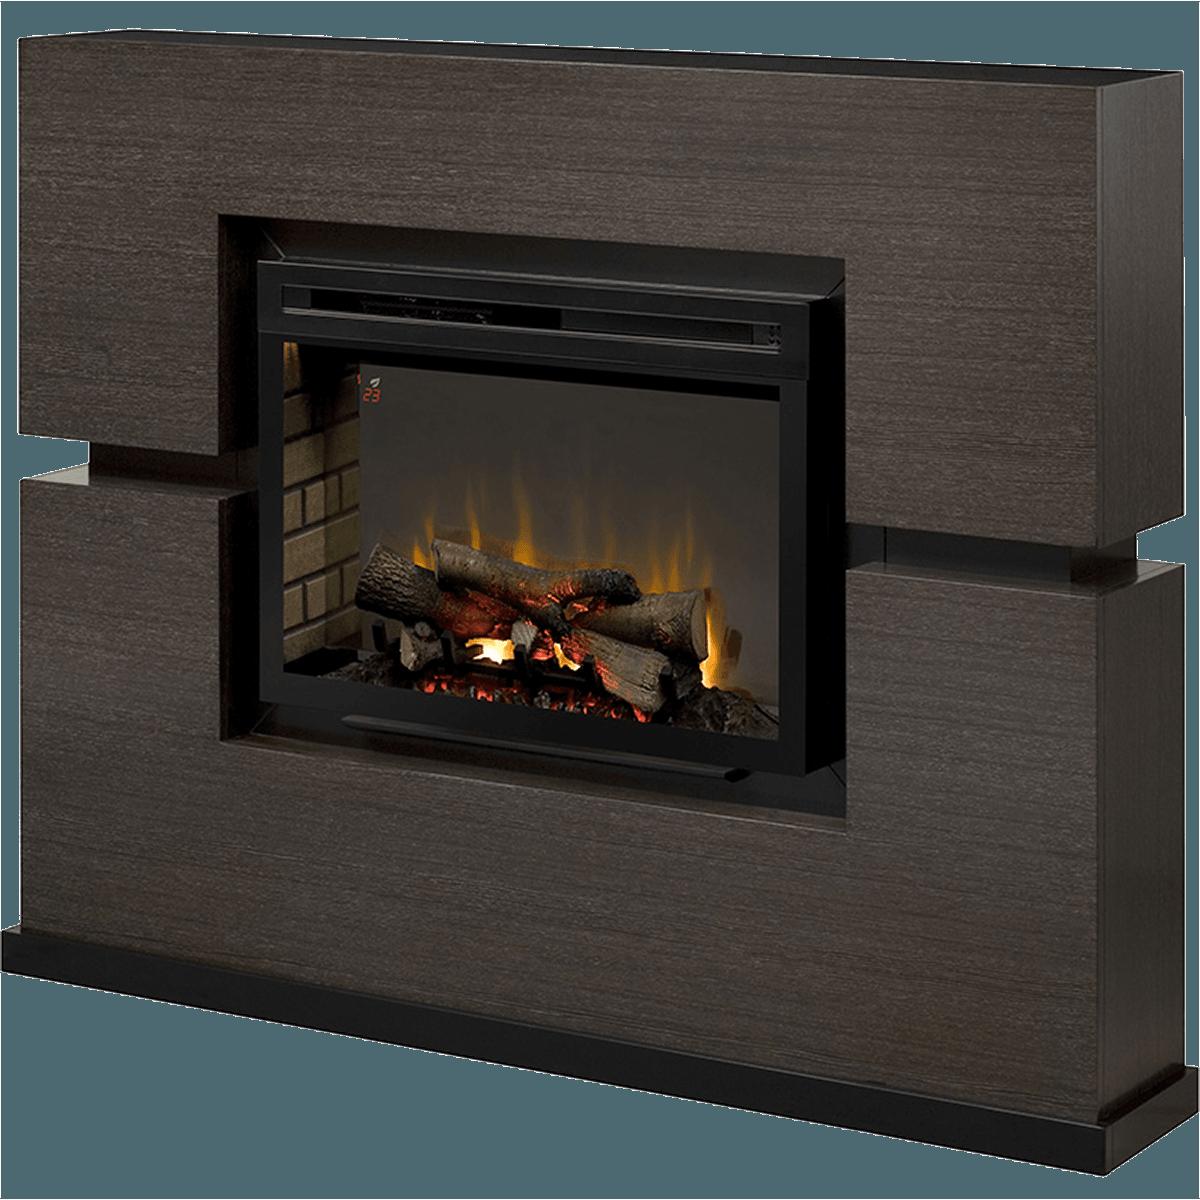 Portable Fireplace Lovely Dimplex Elektro Kamin Teile Kamin Kamin